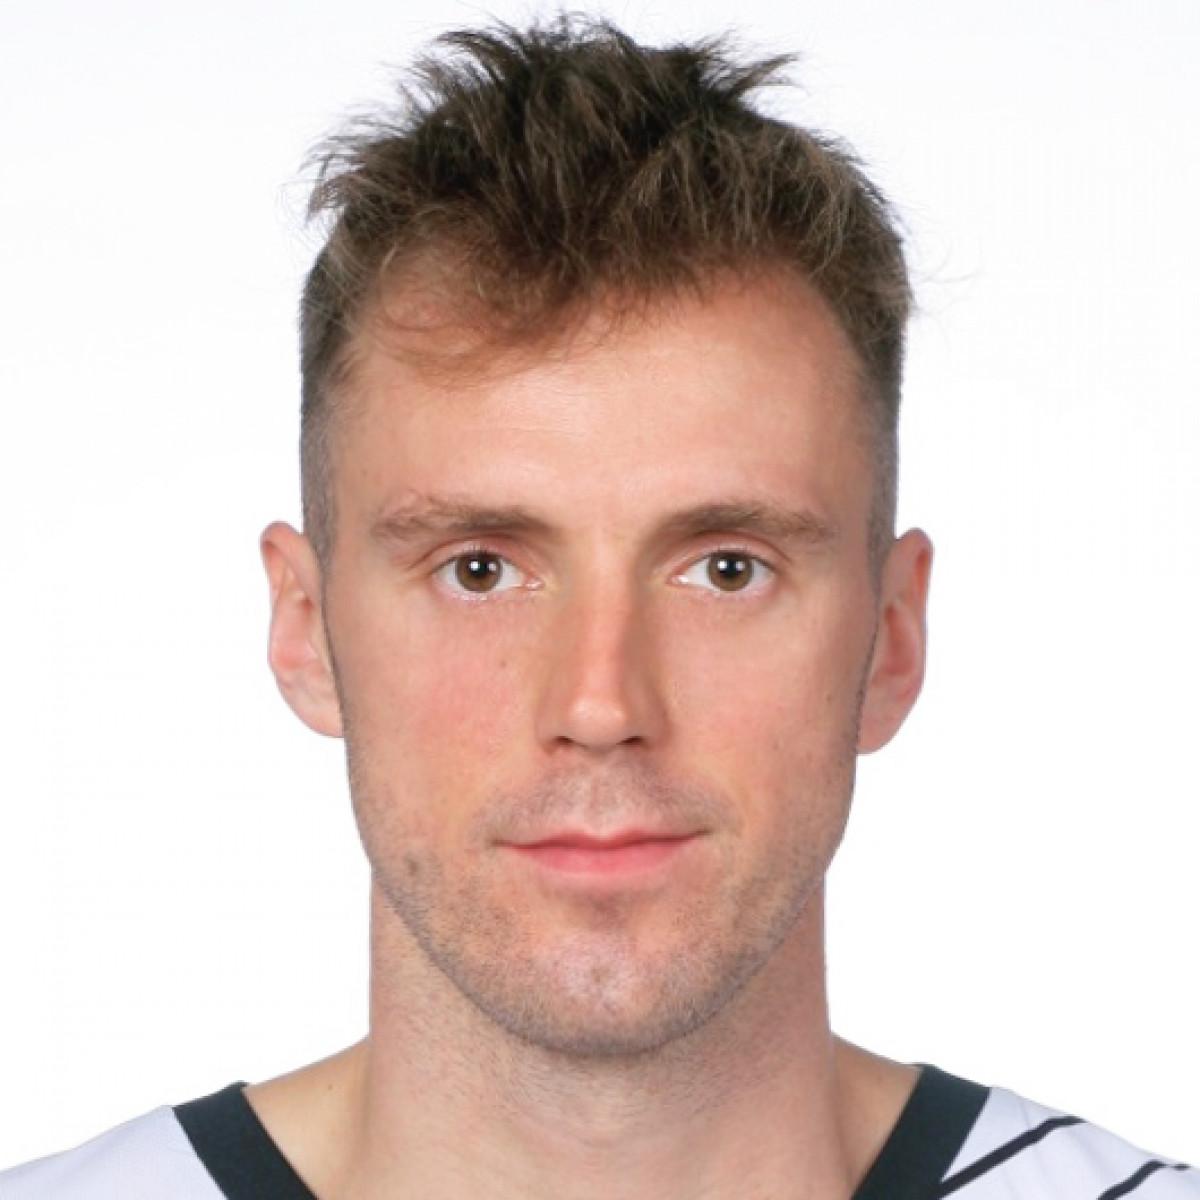 Damian Pieloch